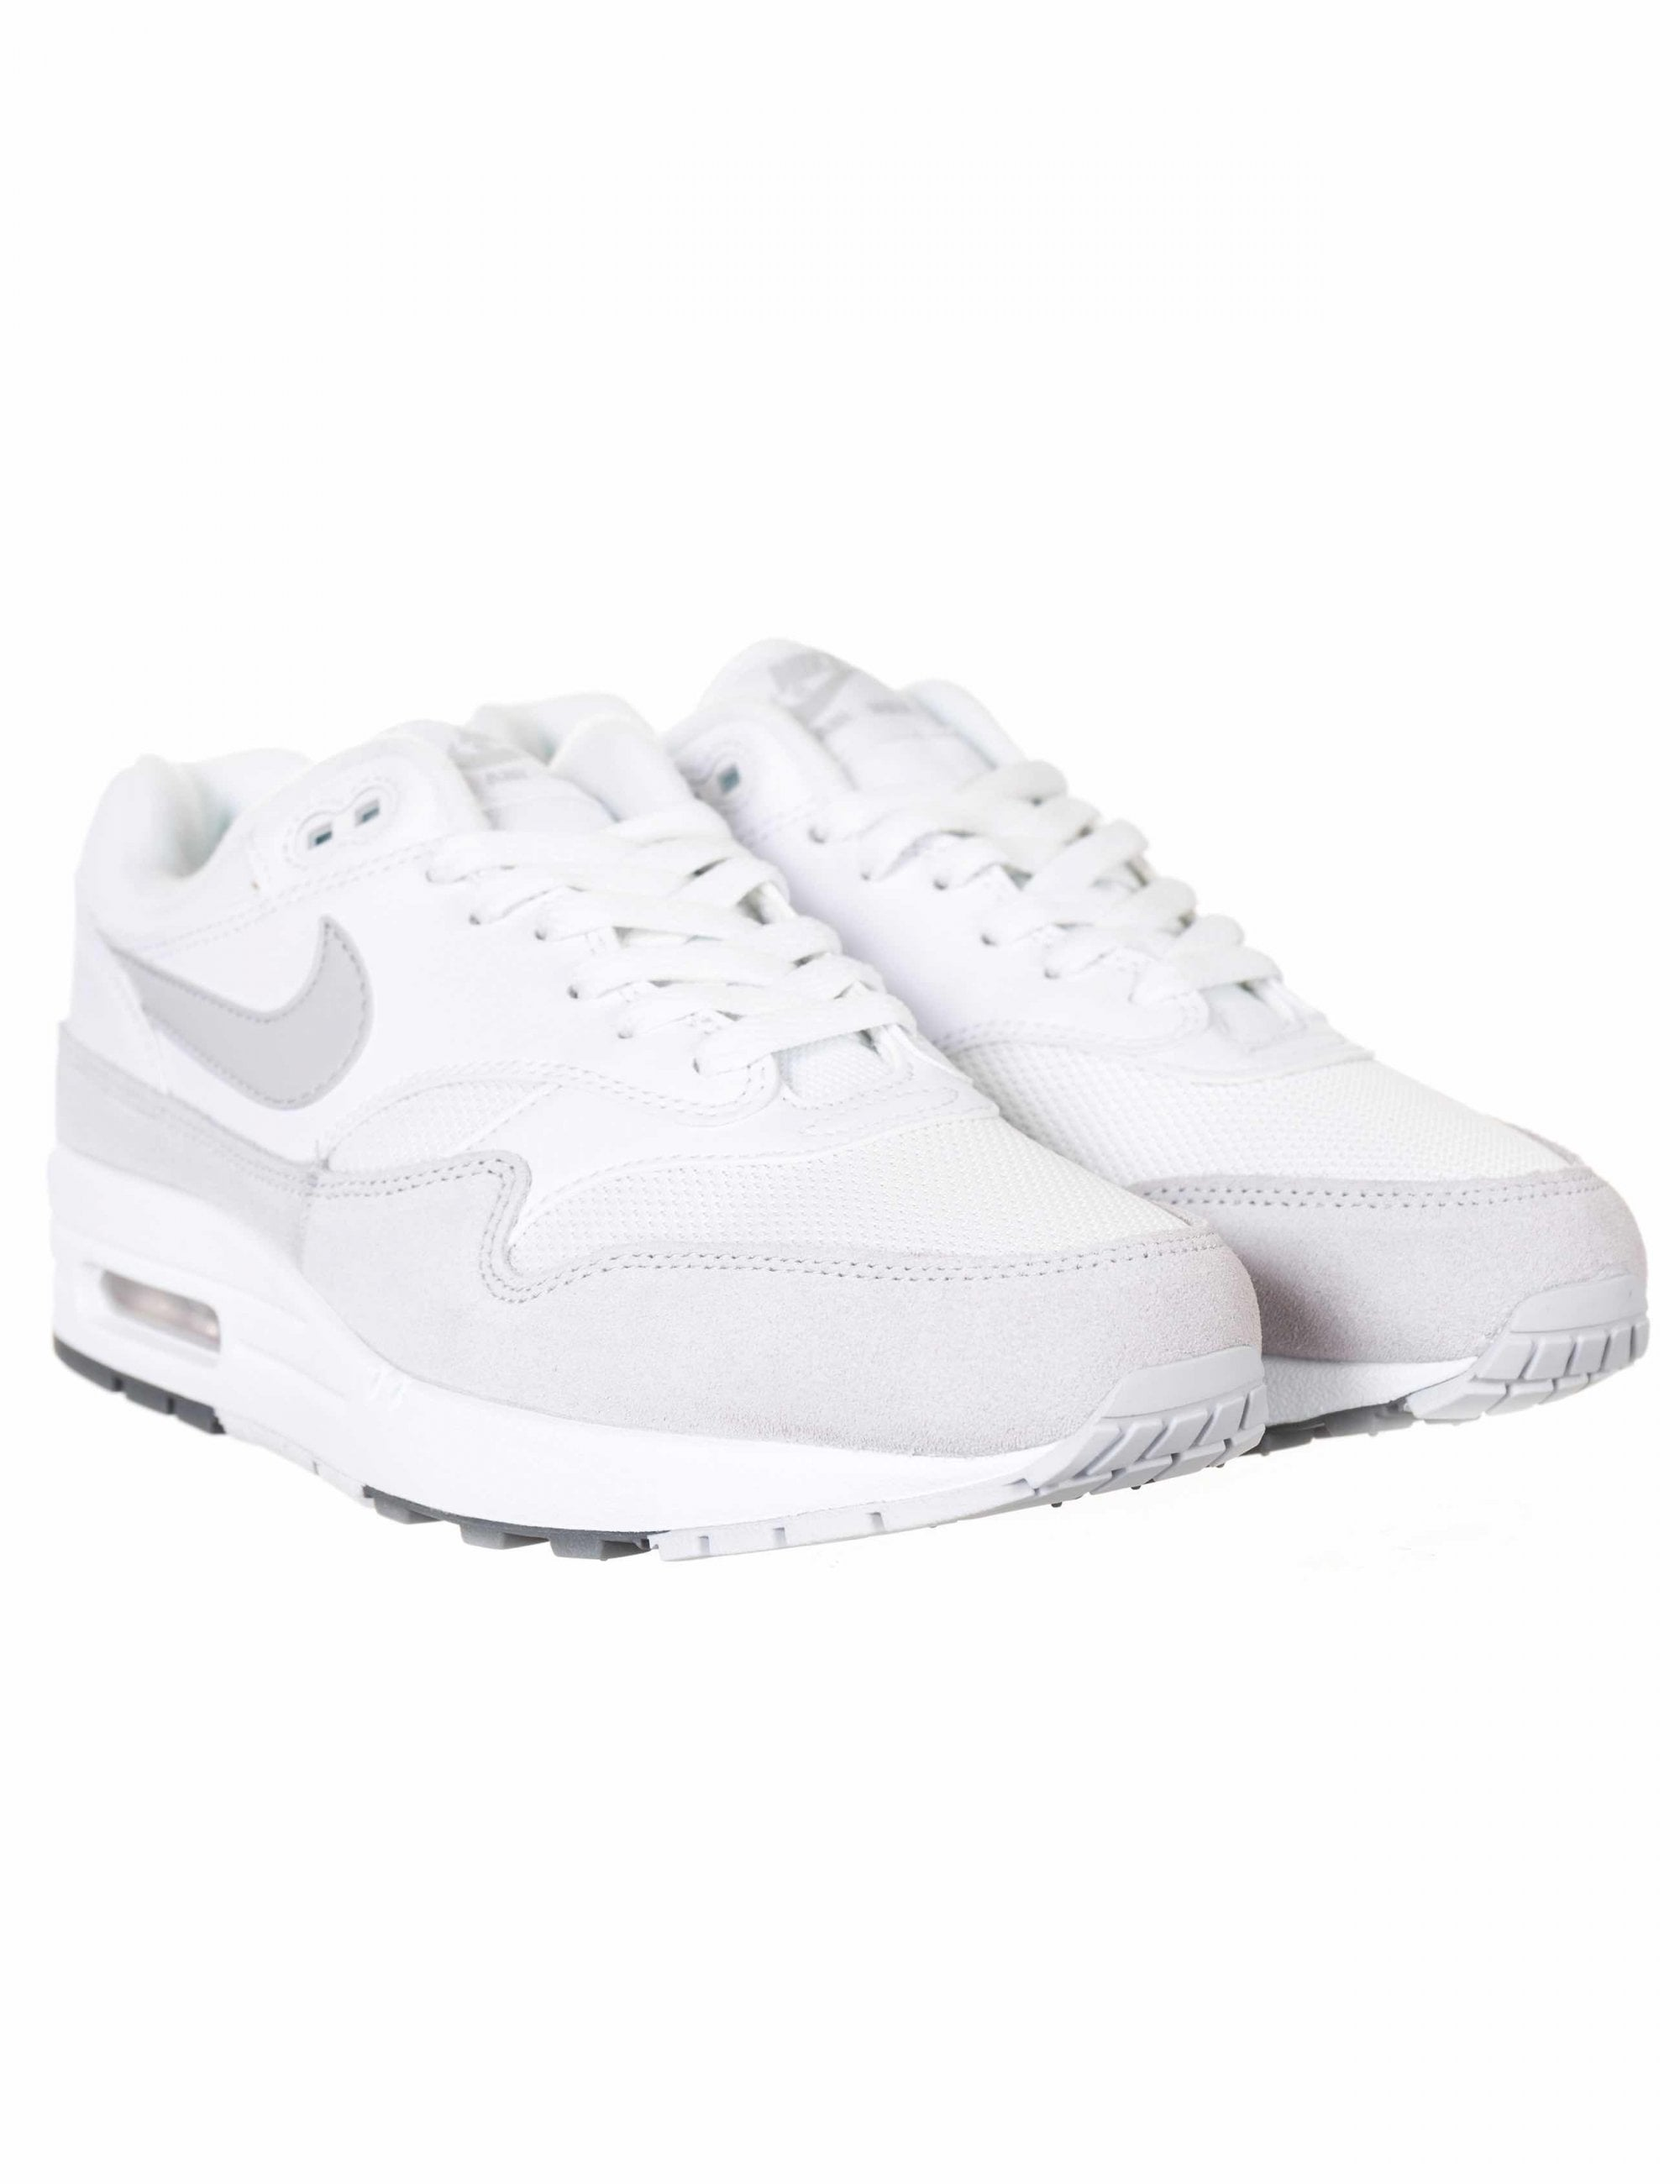 Nike Air Max 1 Trainers - White/Pure